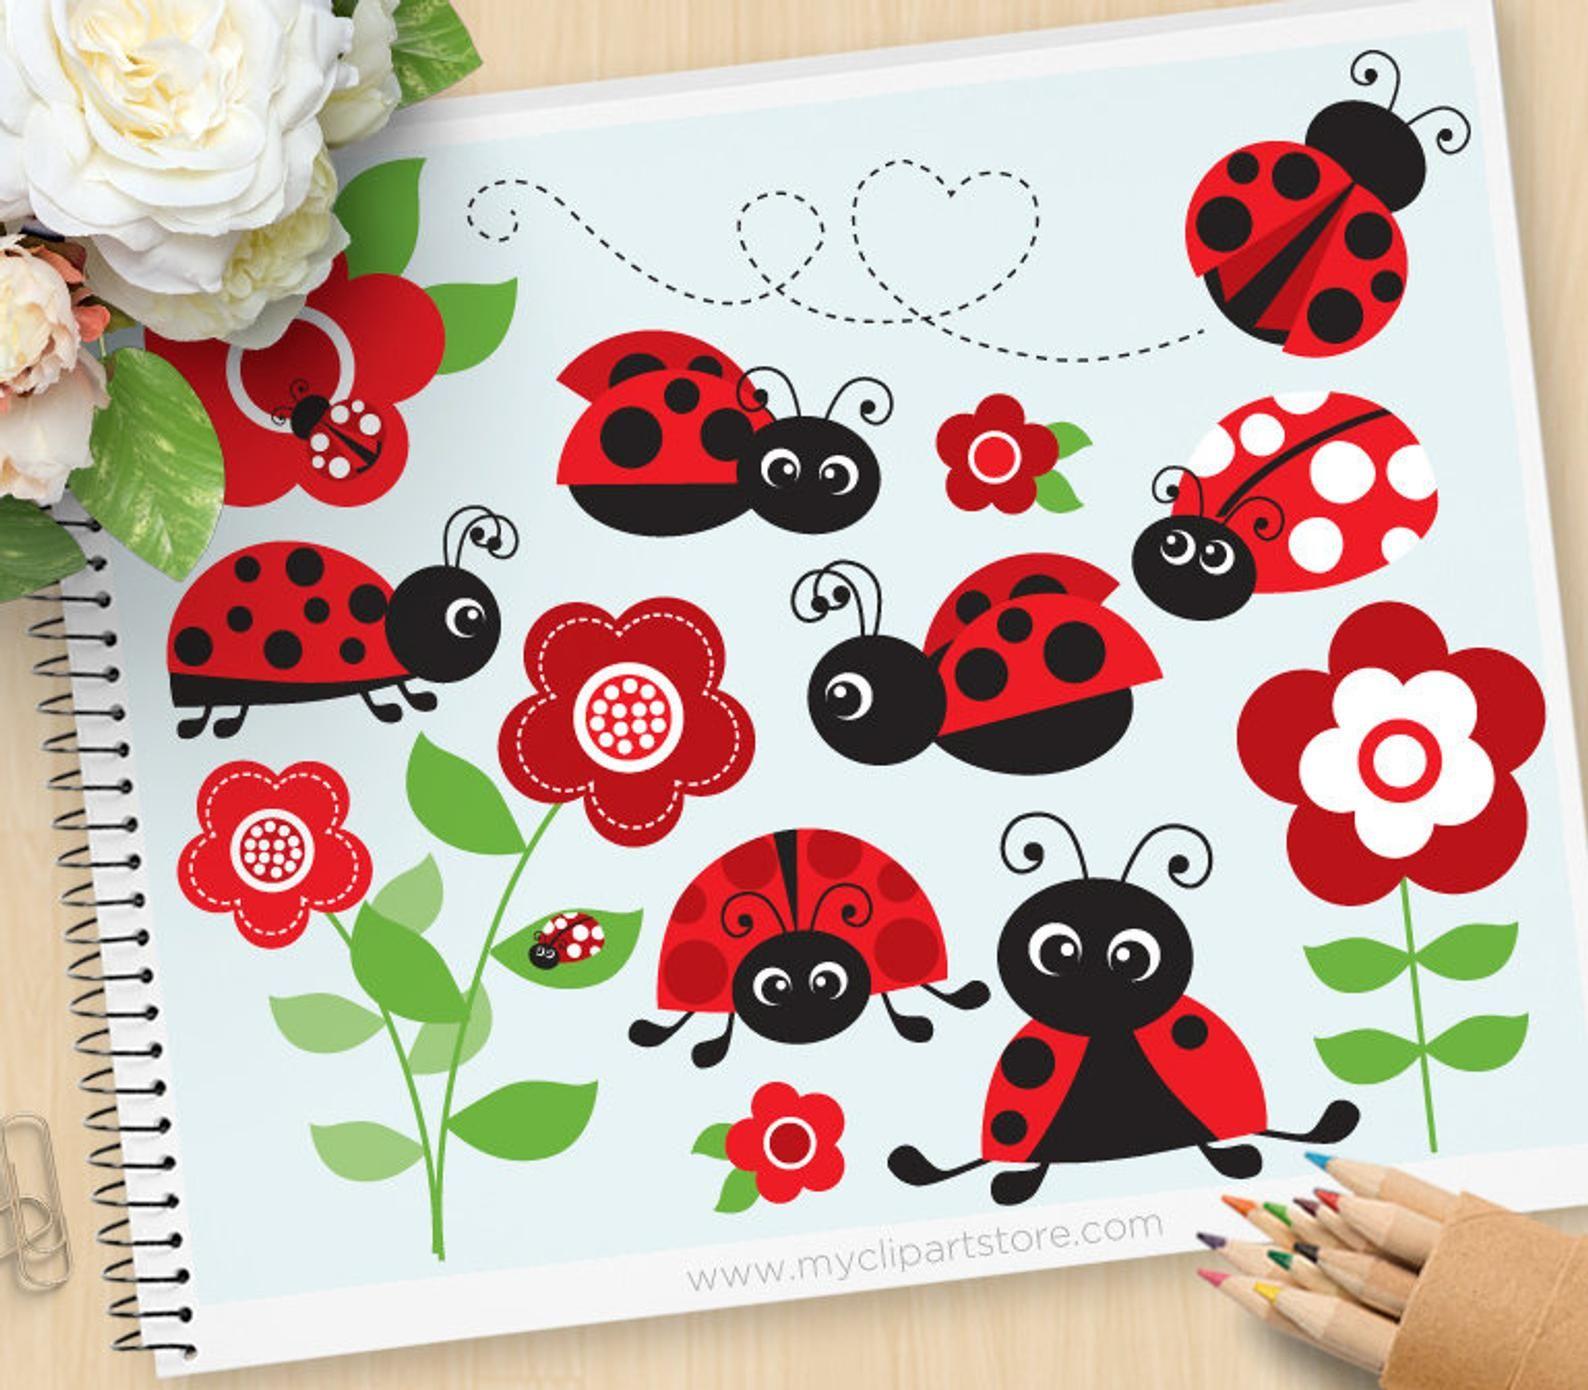 Ladybug red ladybugs ladybirds. Gardening clipart insect garden